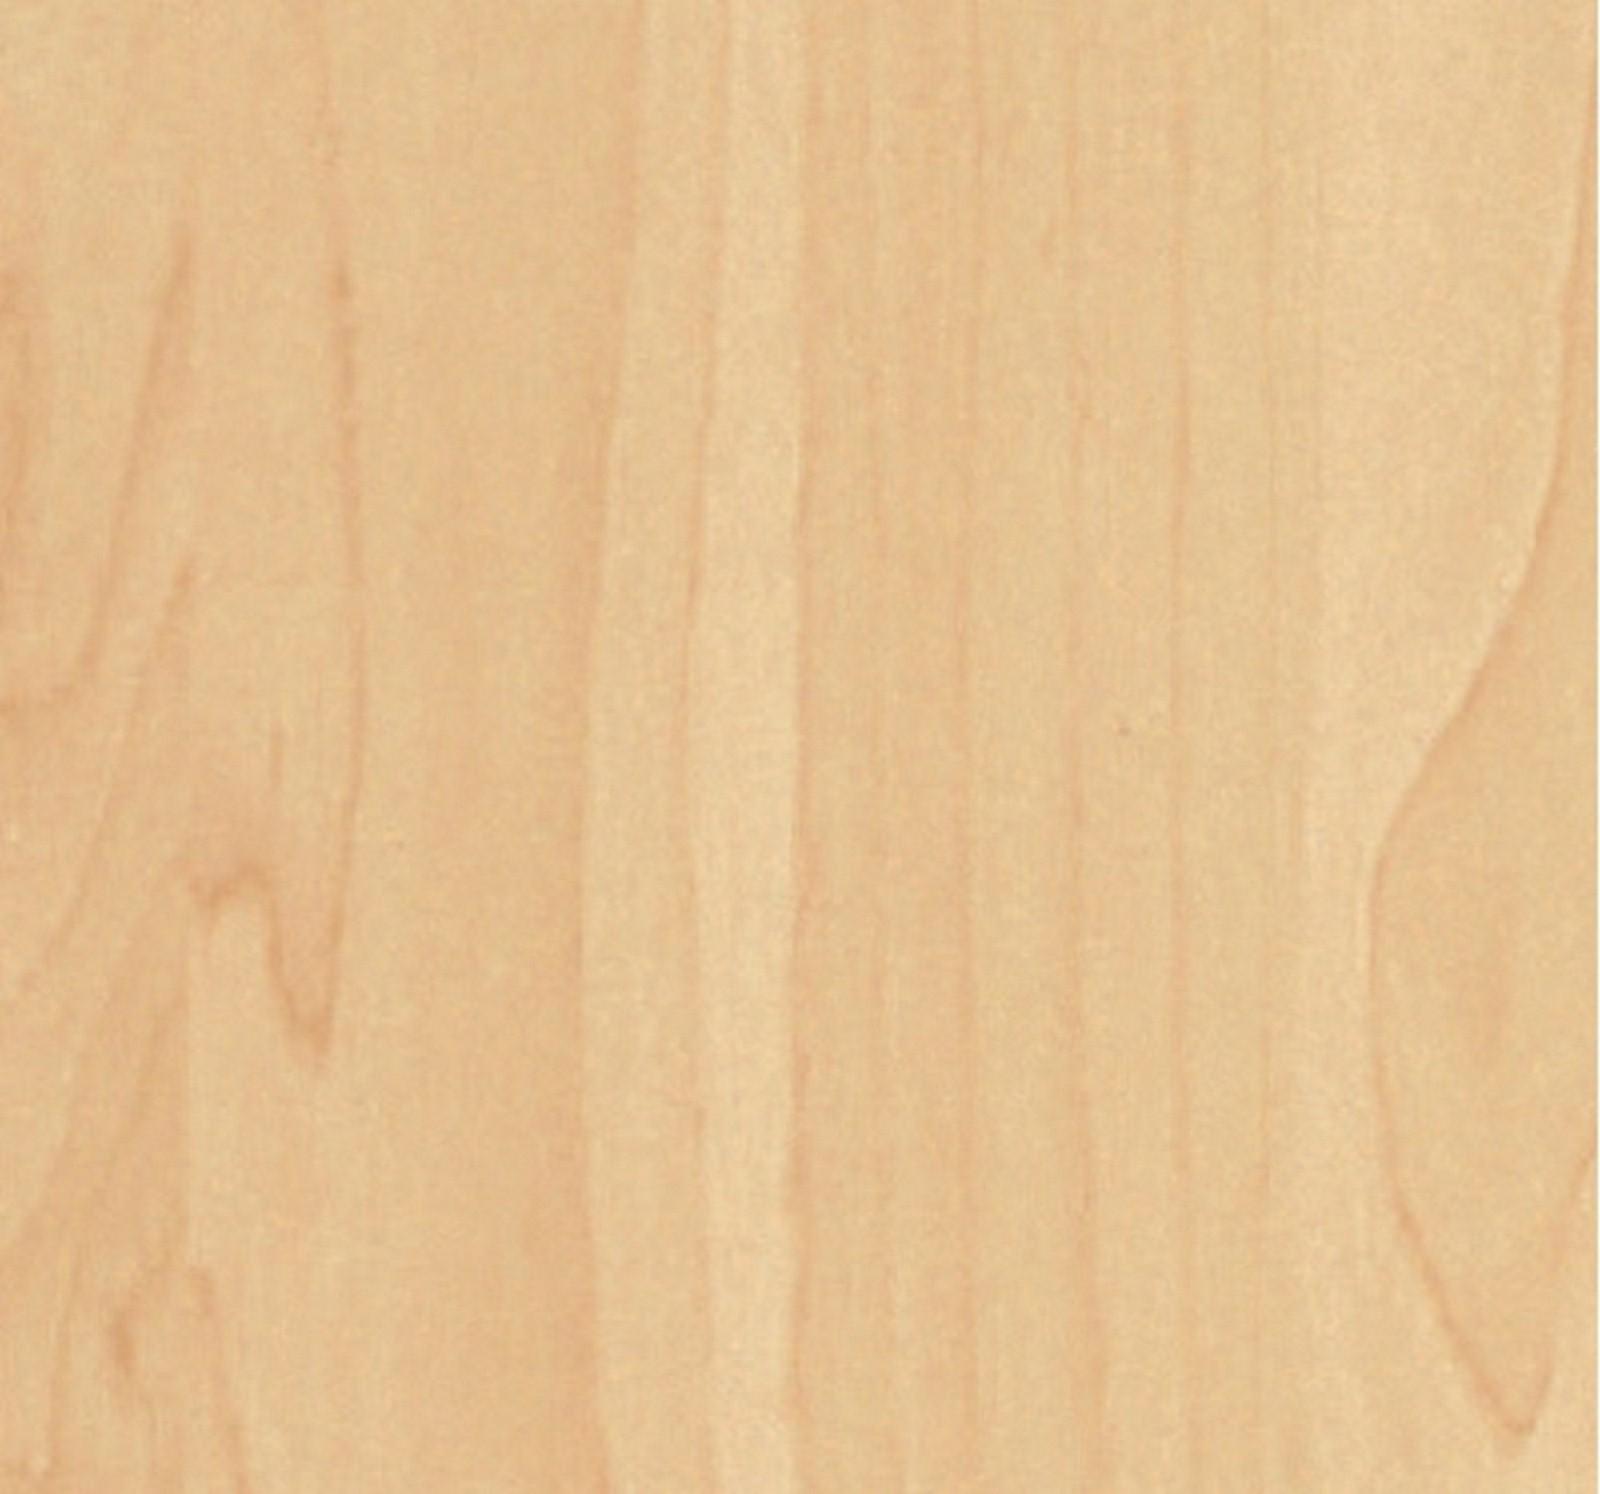 klebefolie holzoptik buche hell m belfolie dekorfolie 45 x 200 cm klebefolie holzoptik. Black Bedroom Furniture Sets. Home Design Ideas